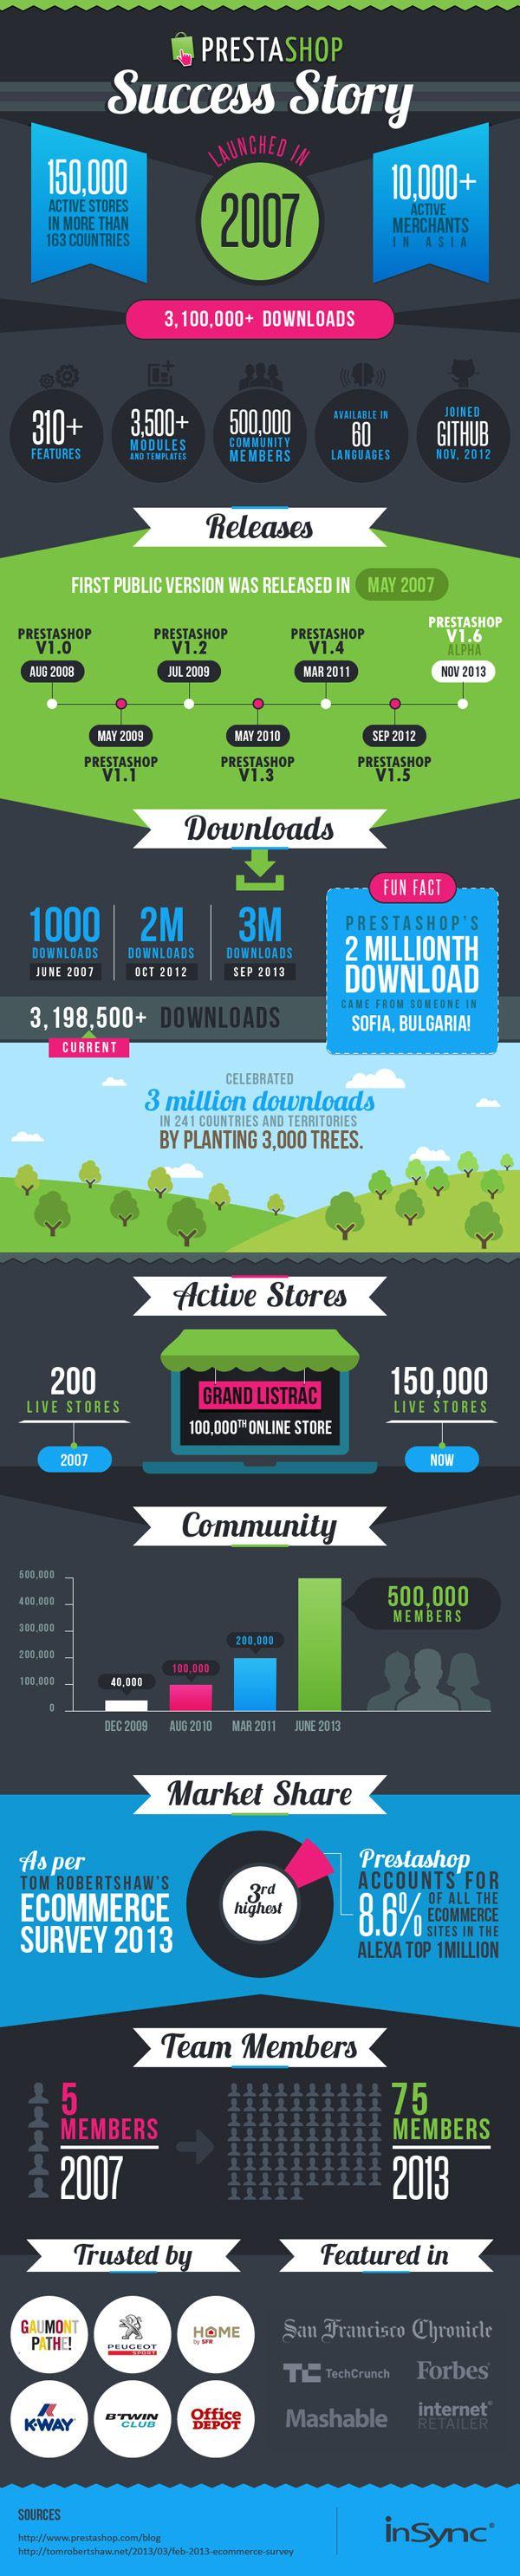 Prestashop Success Story | #Infographic  #Prestashop